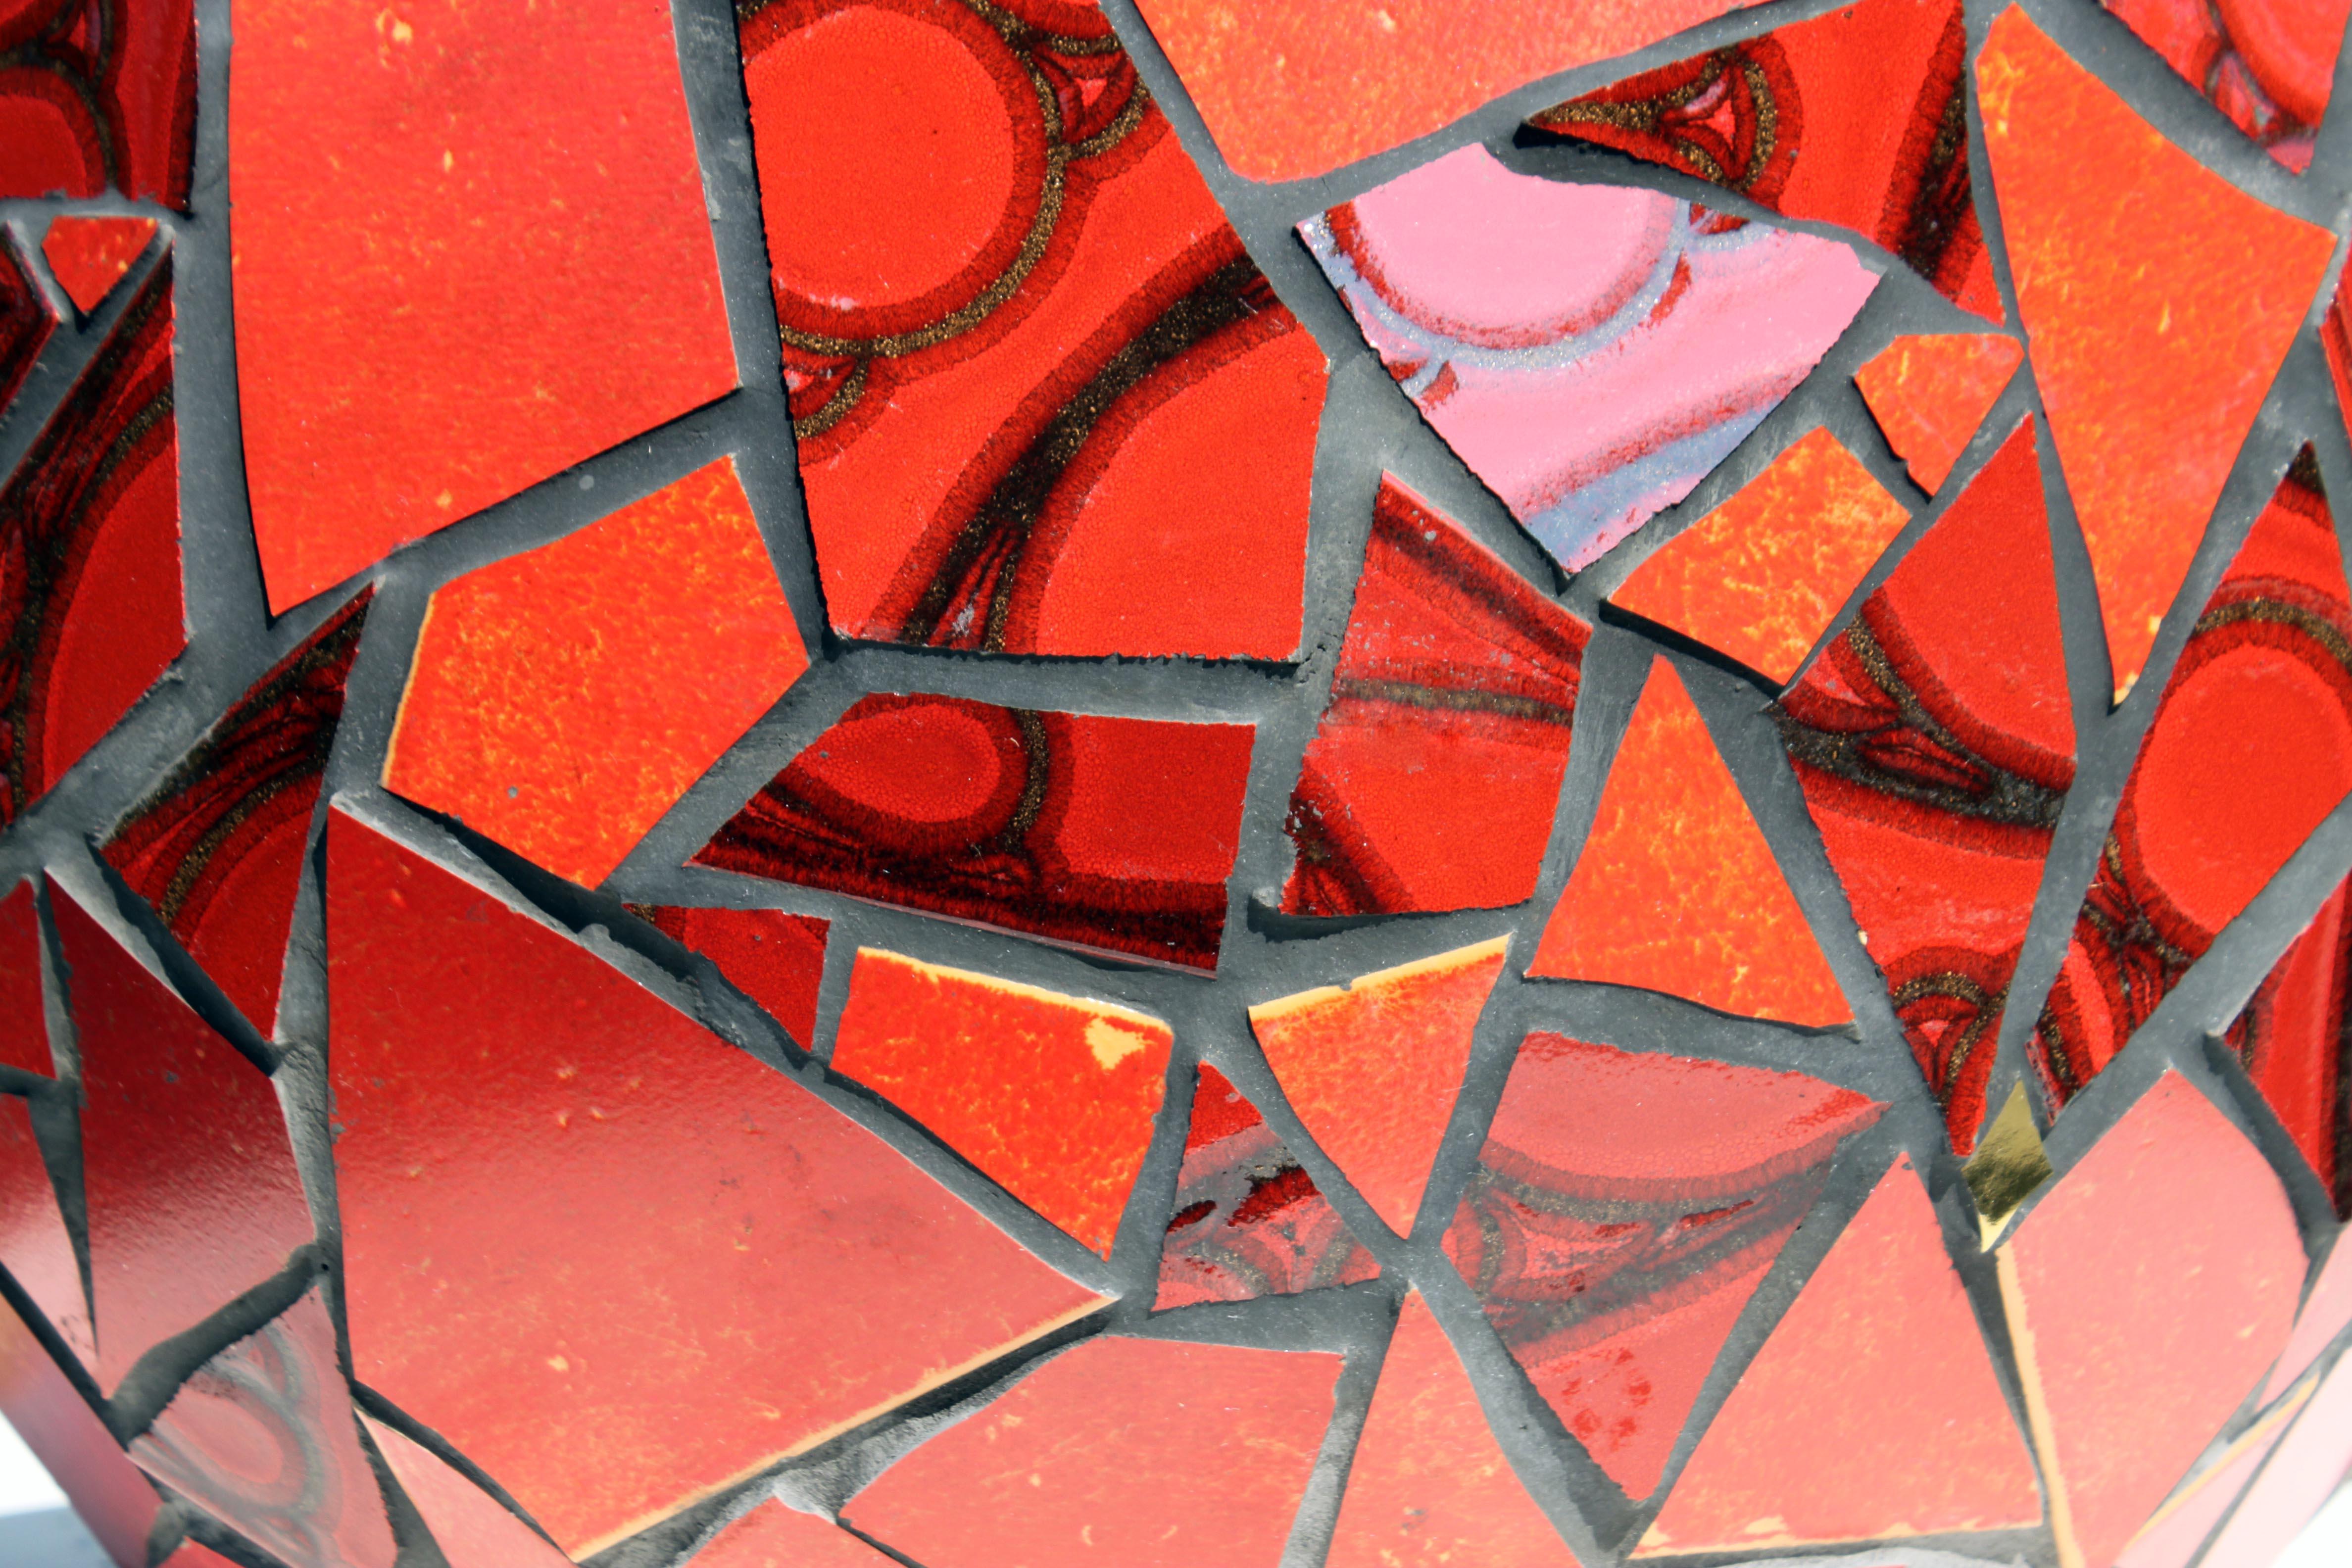 cerveny velky detail3.jpg